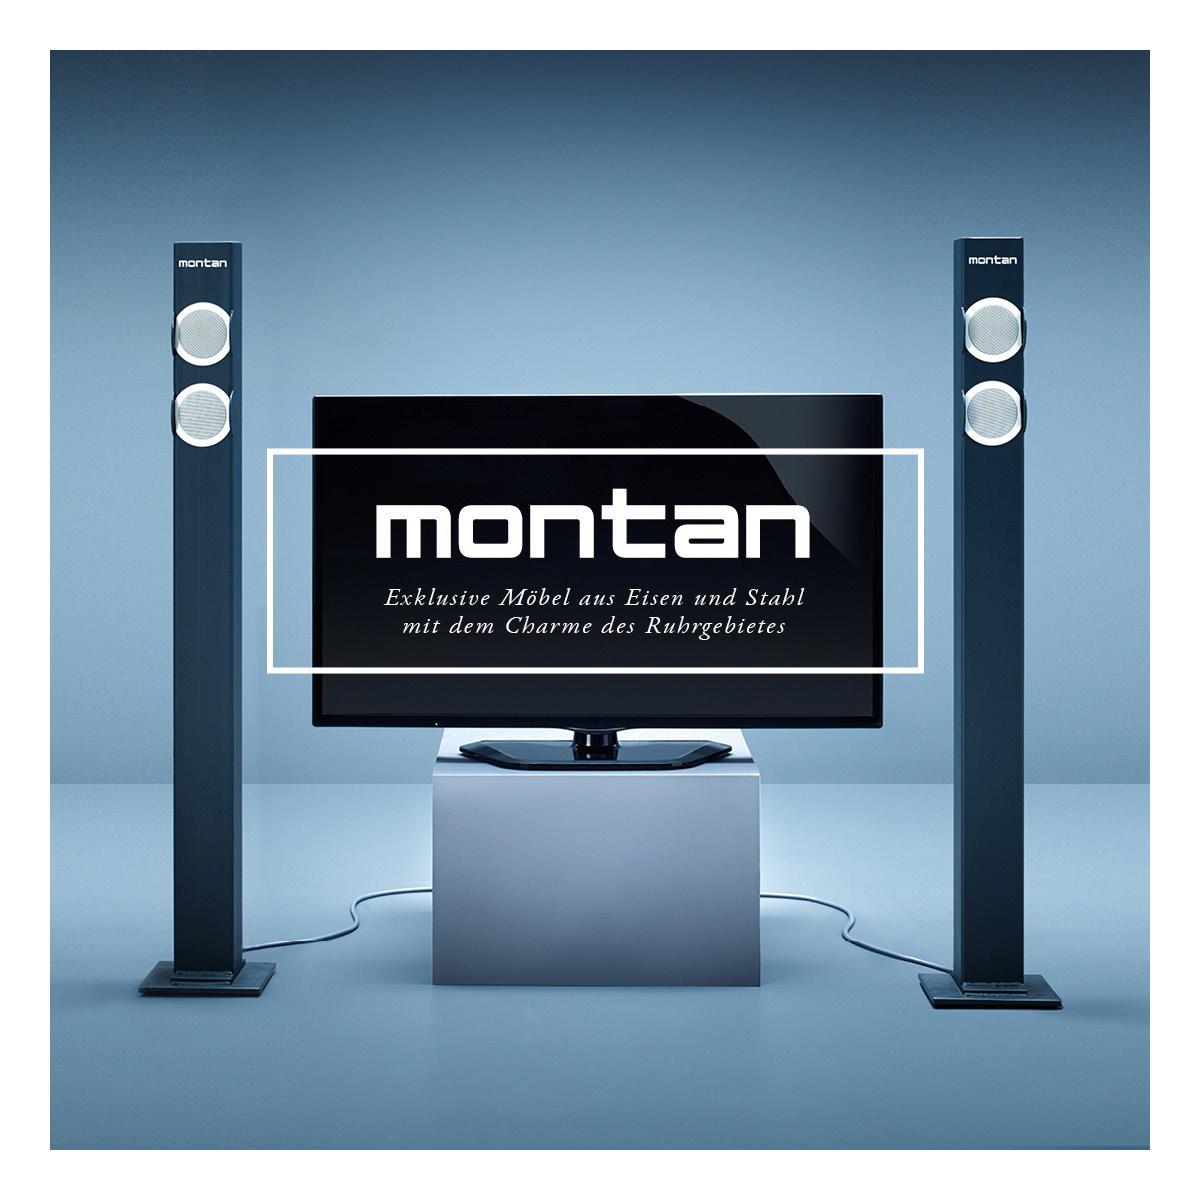 MONTAN_SM_SquarePosts5